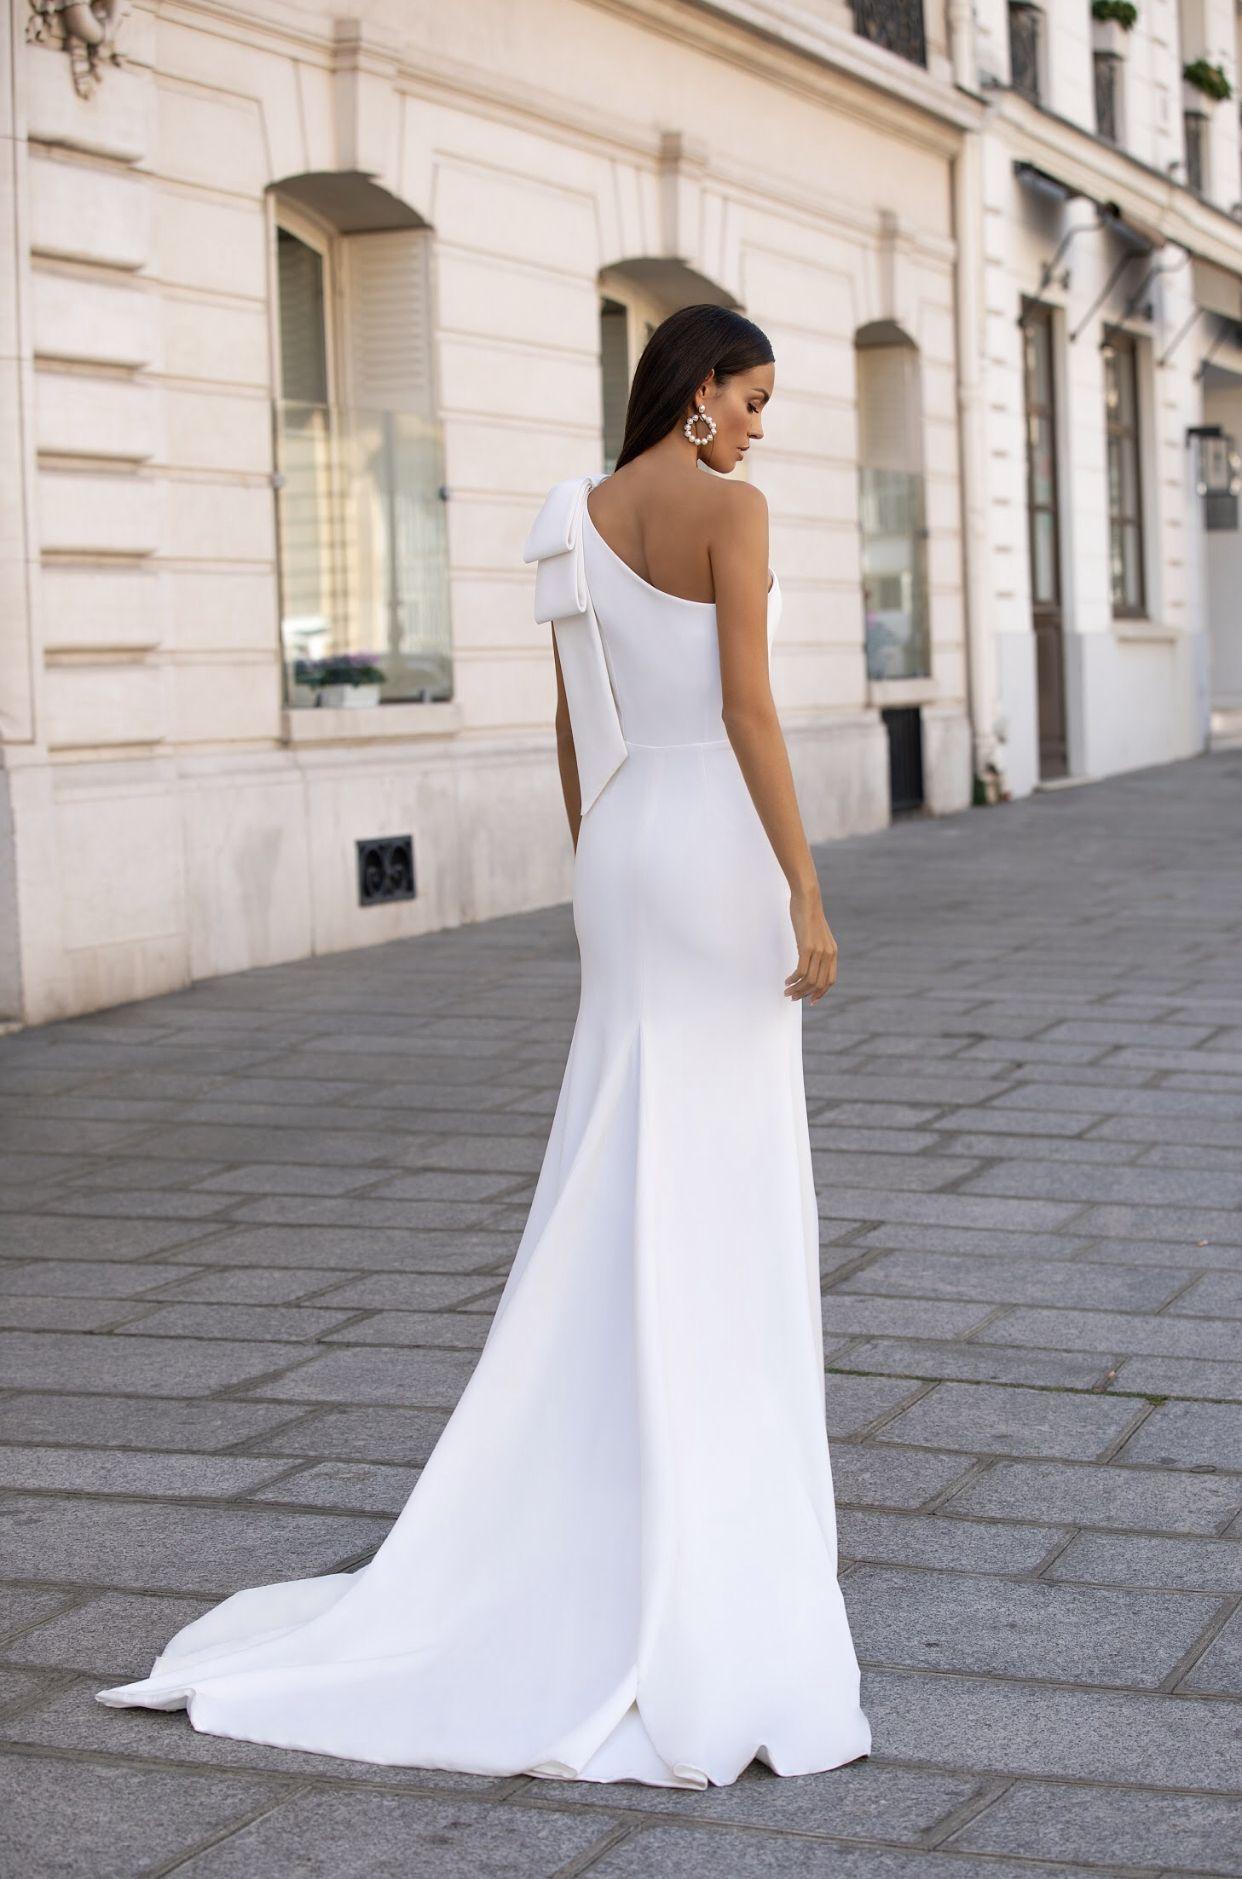 Simple elegant wedding gown Milla Nova in 2020 Chic